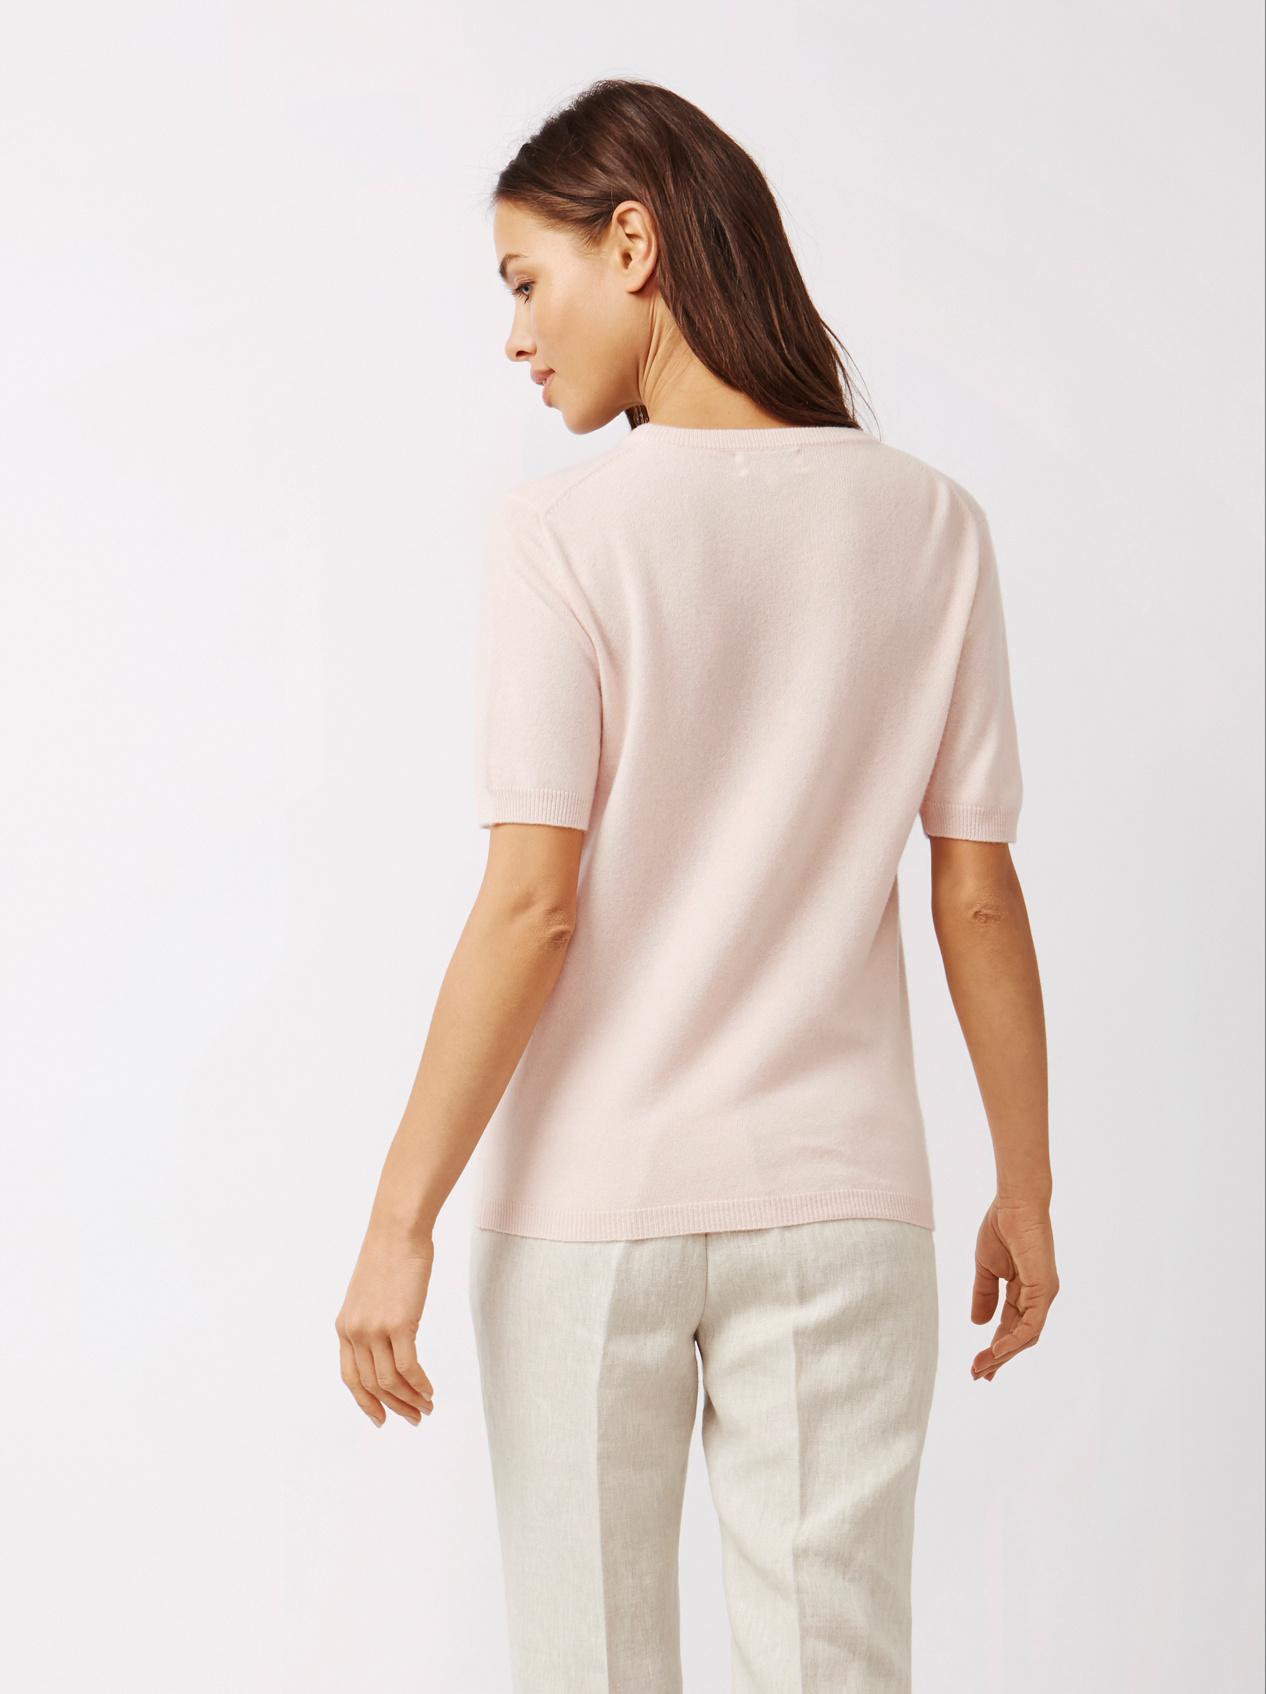 Soft Goat Women's Short Sleeve O-Neck Powder